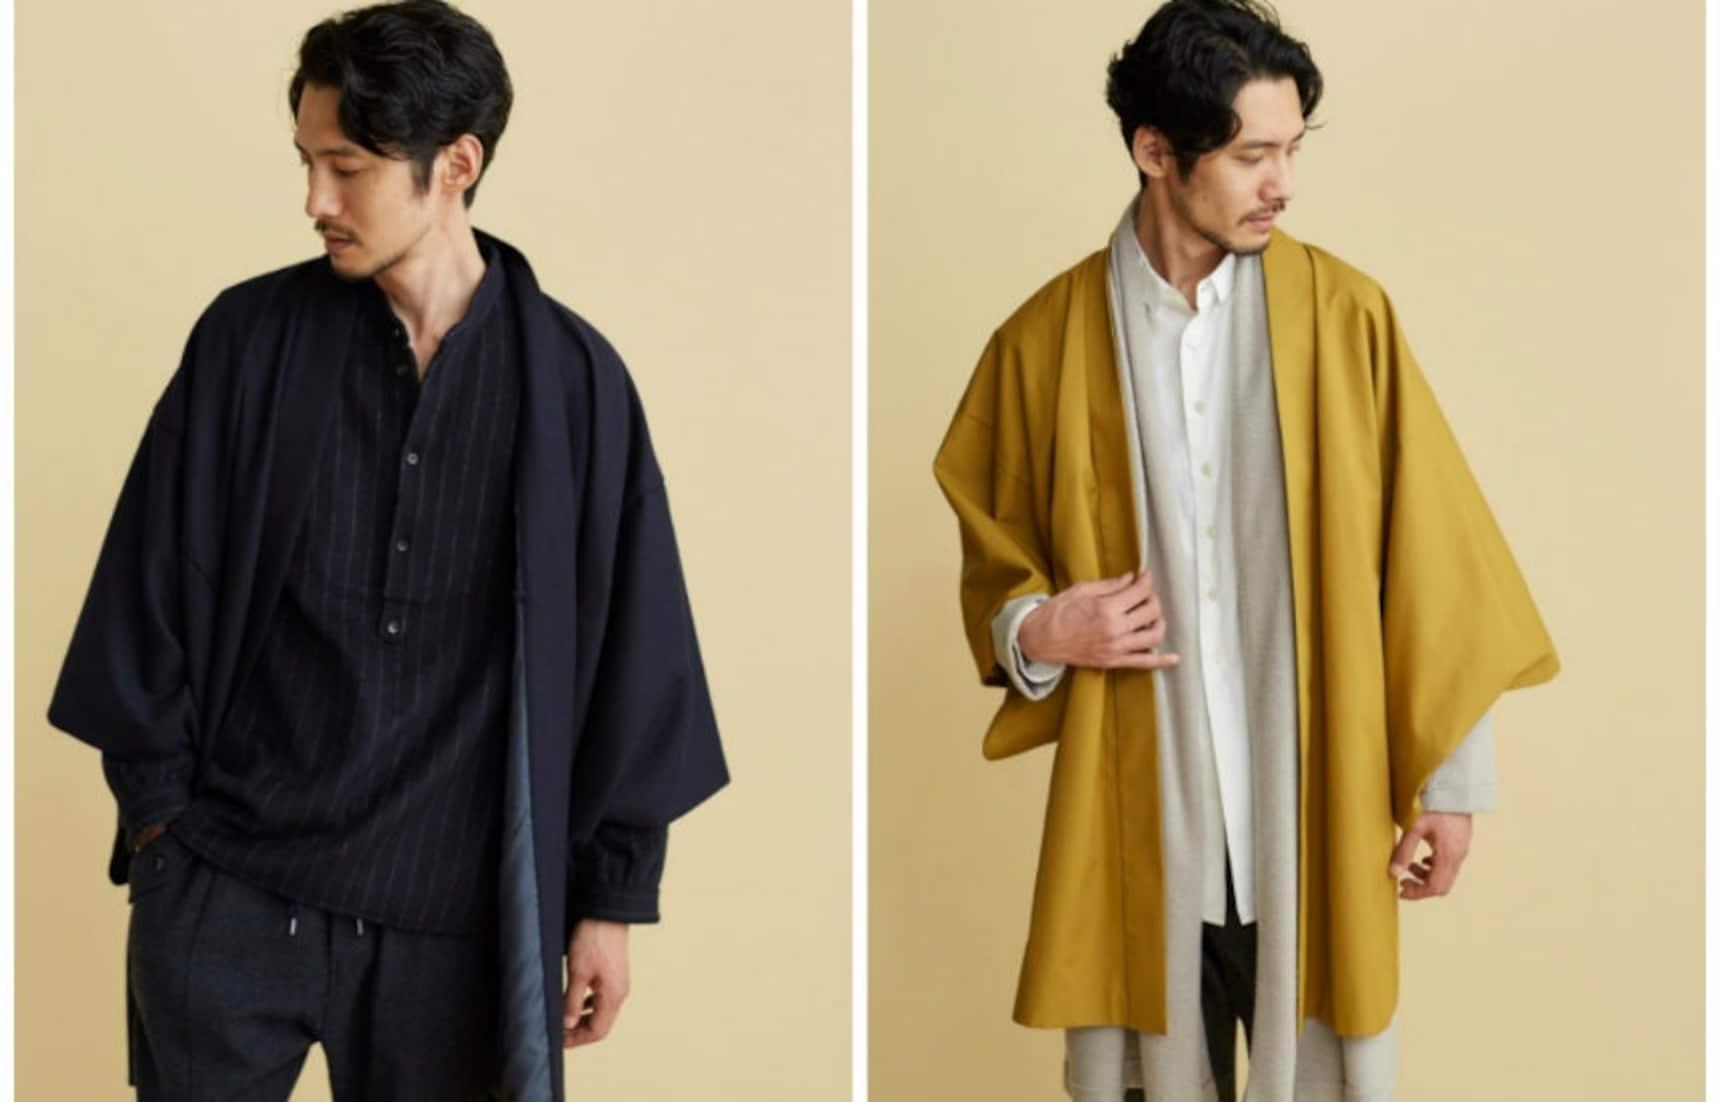 Bundle Up this Winter with a Samurai Coat